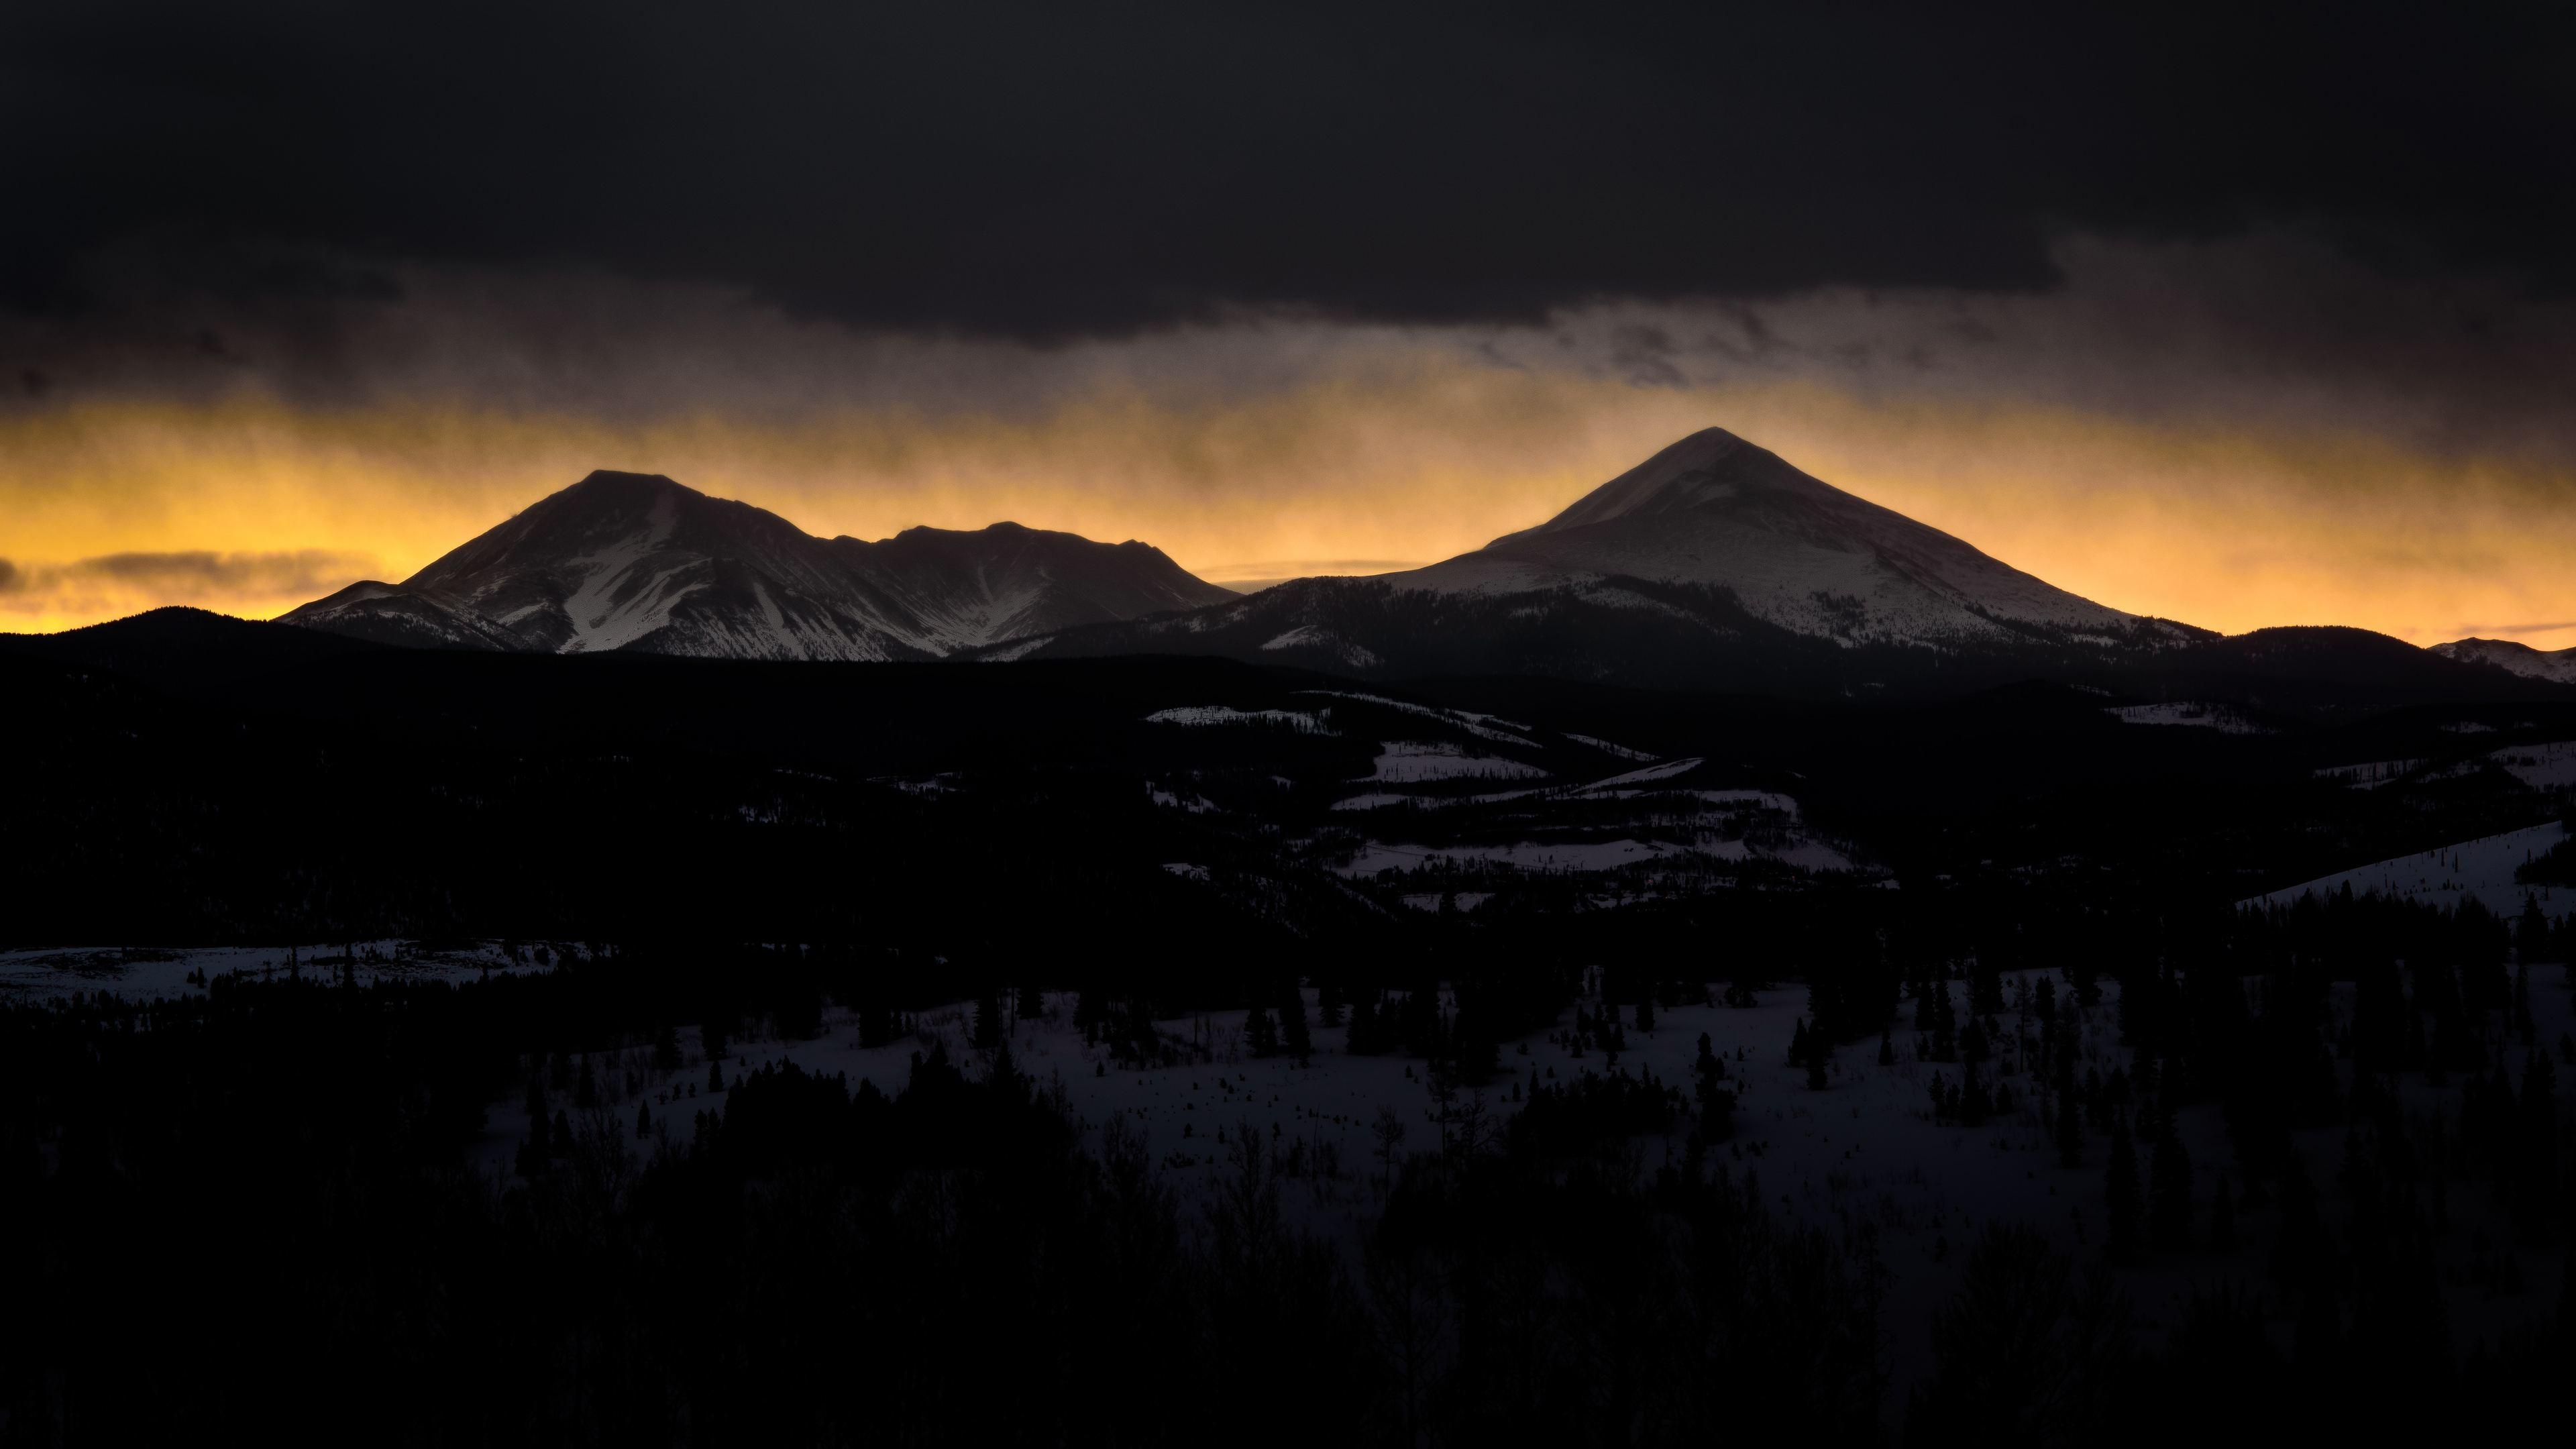 mountain shadow dark cloud and light 4k 1540133290 - Mountain Shadow Dark Cloud And Light 4k - nature wallpapers, mountains wallpapers, hd-wallpapers, 4k-wallpapers